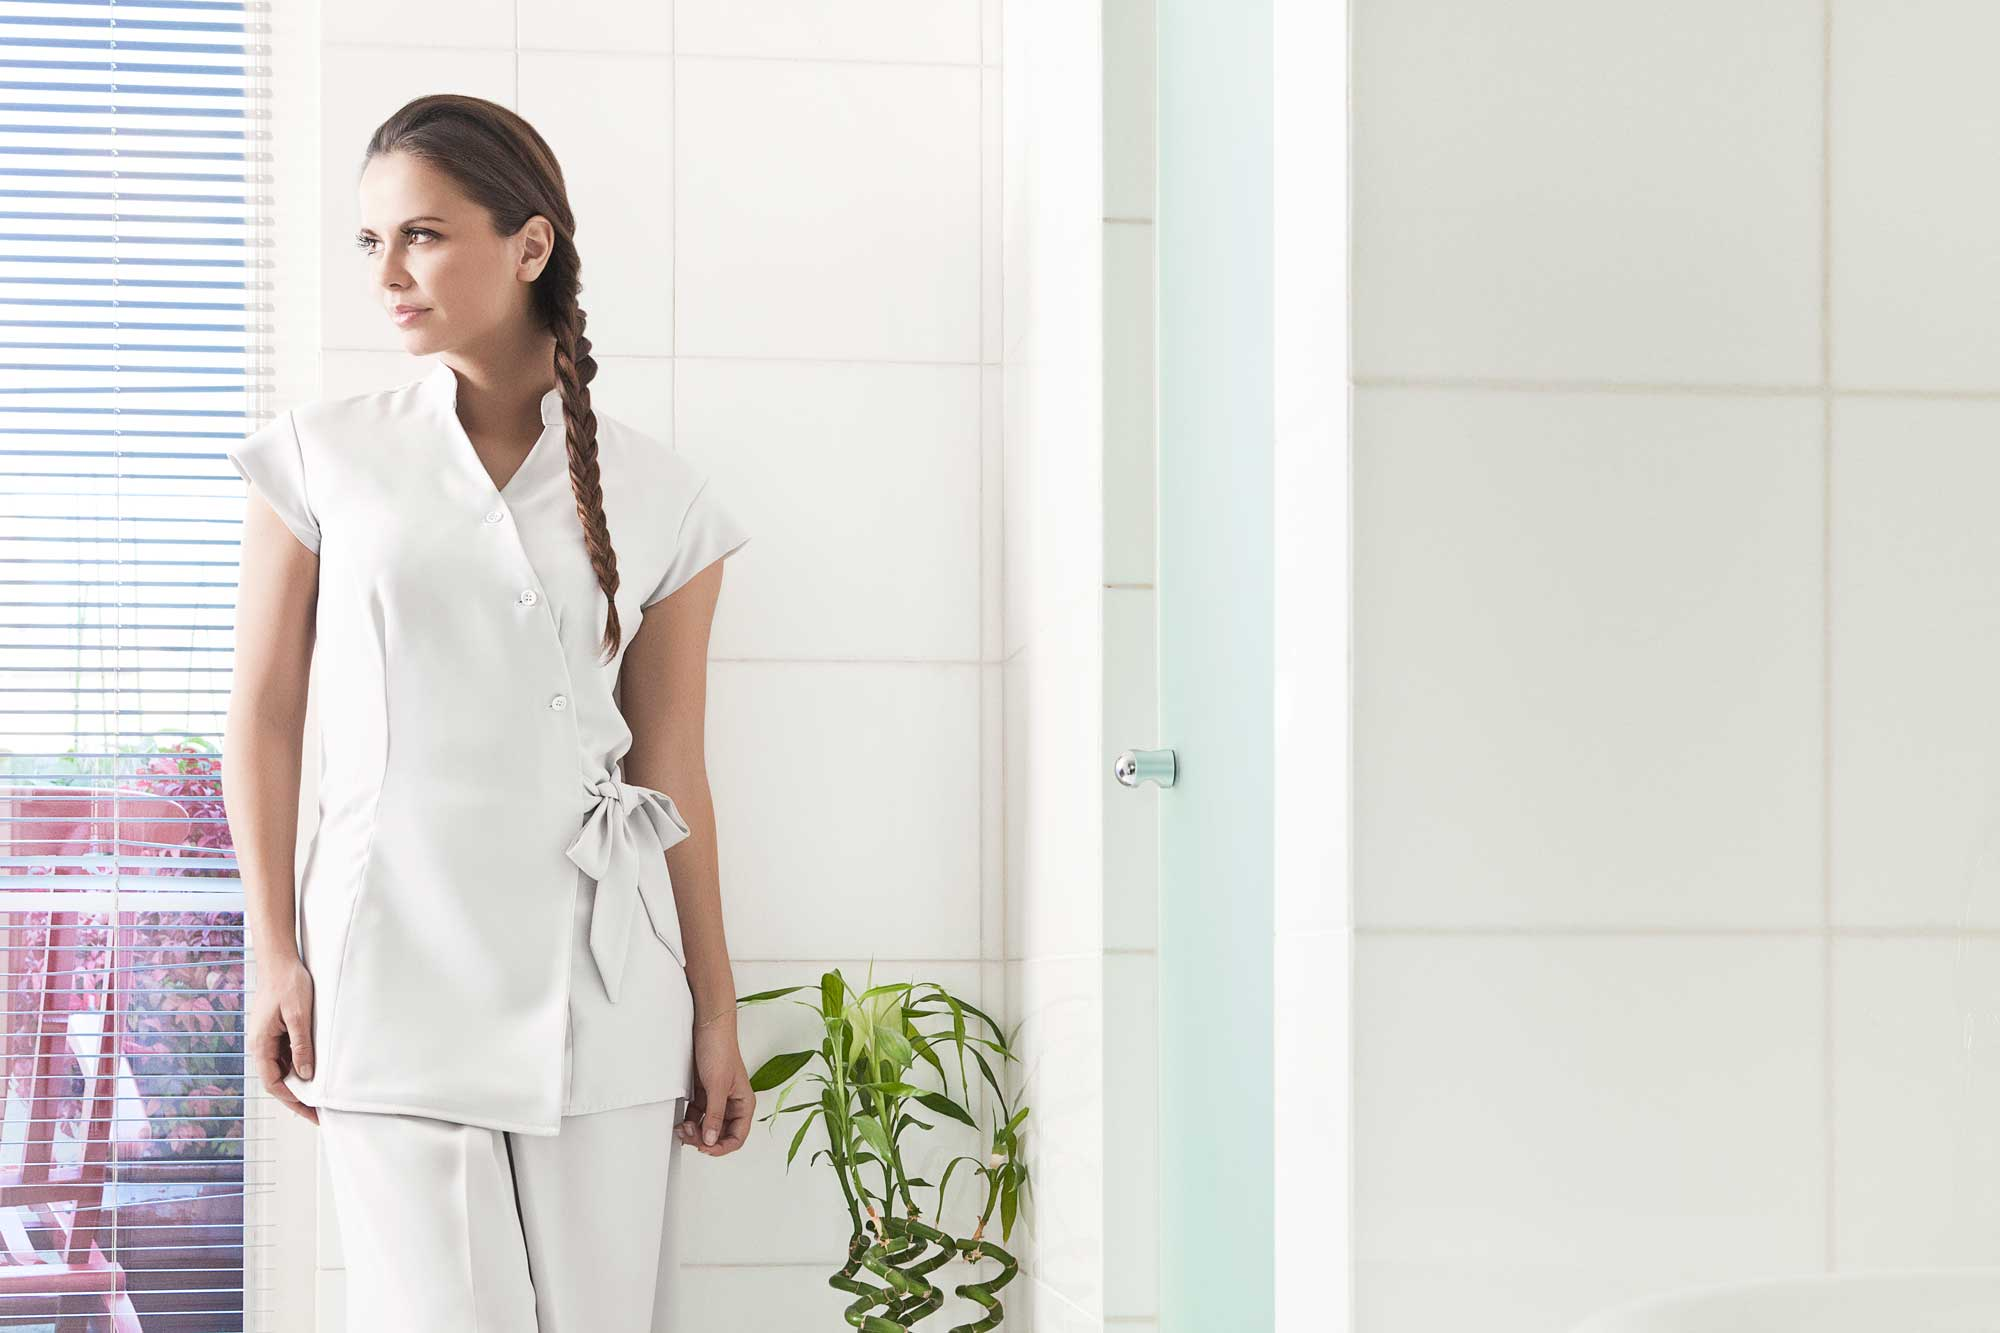 Philness paris uniforme accueil for Salon hotellerie restauration paris